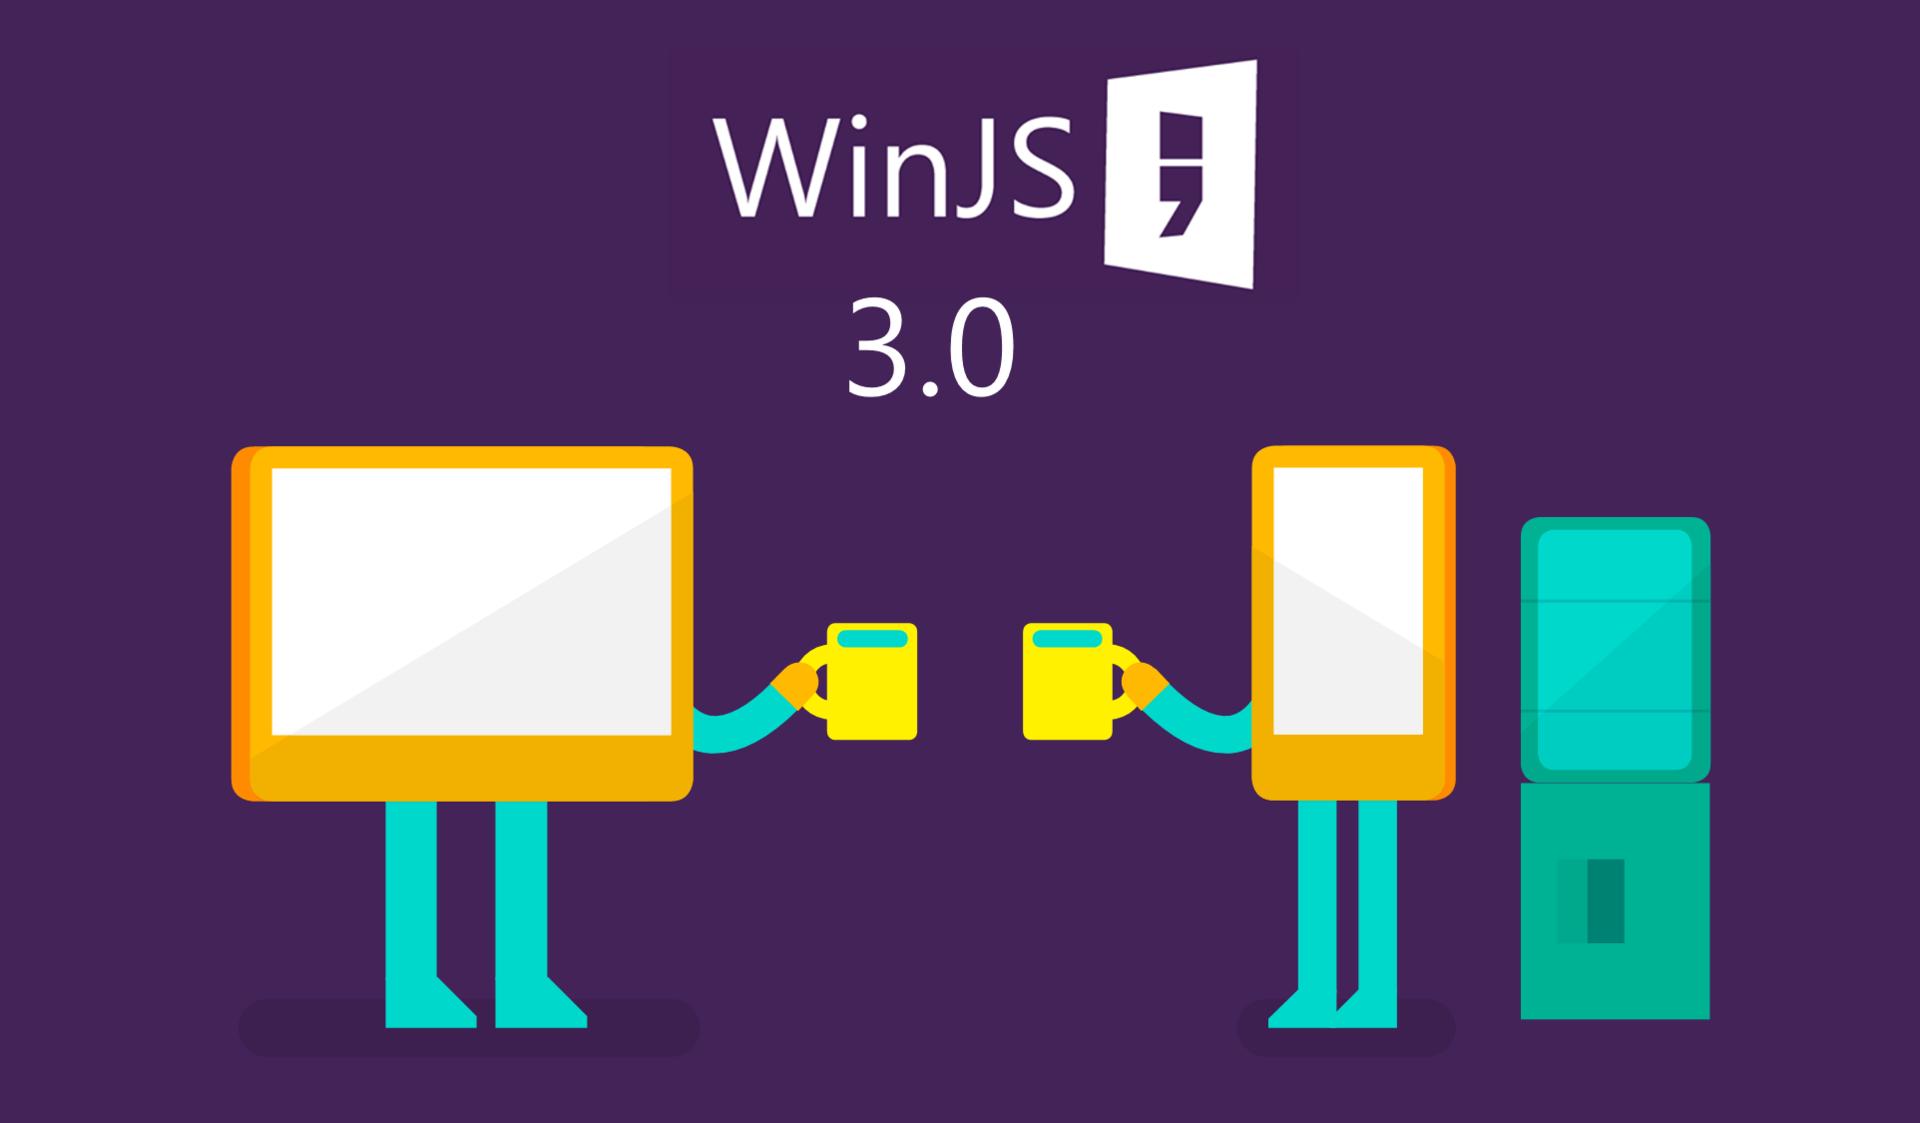 Установка библиотеки WinJS 3.0